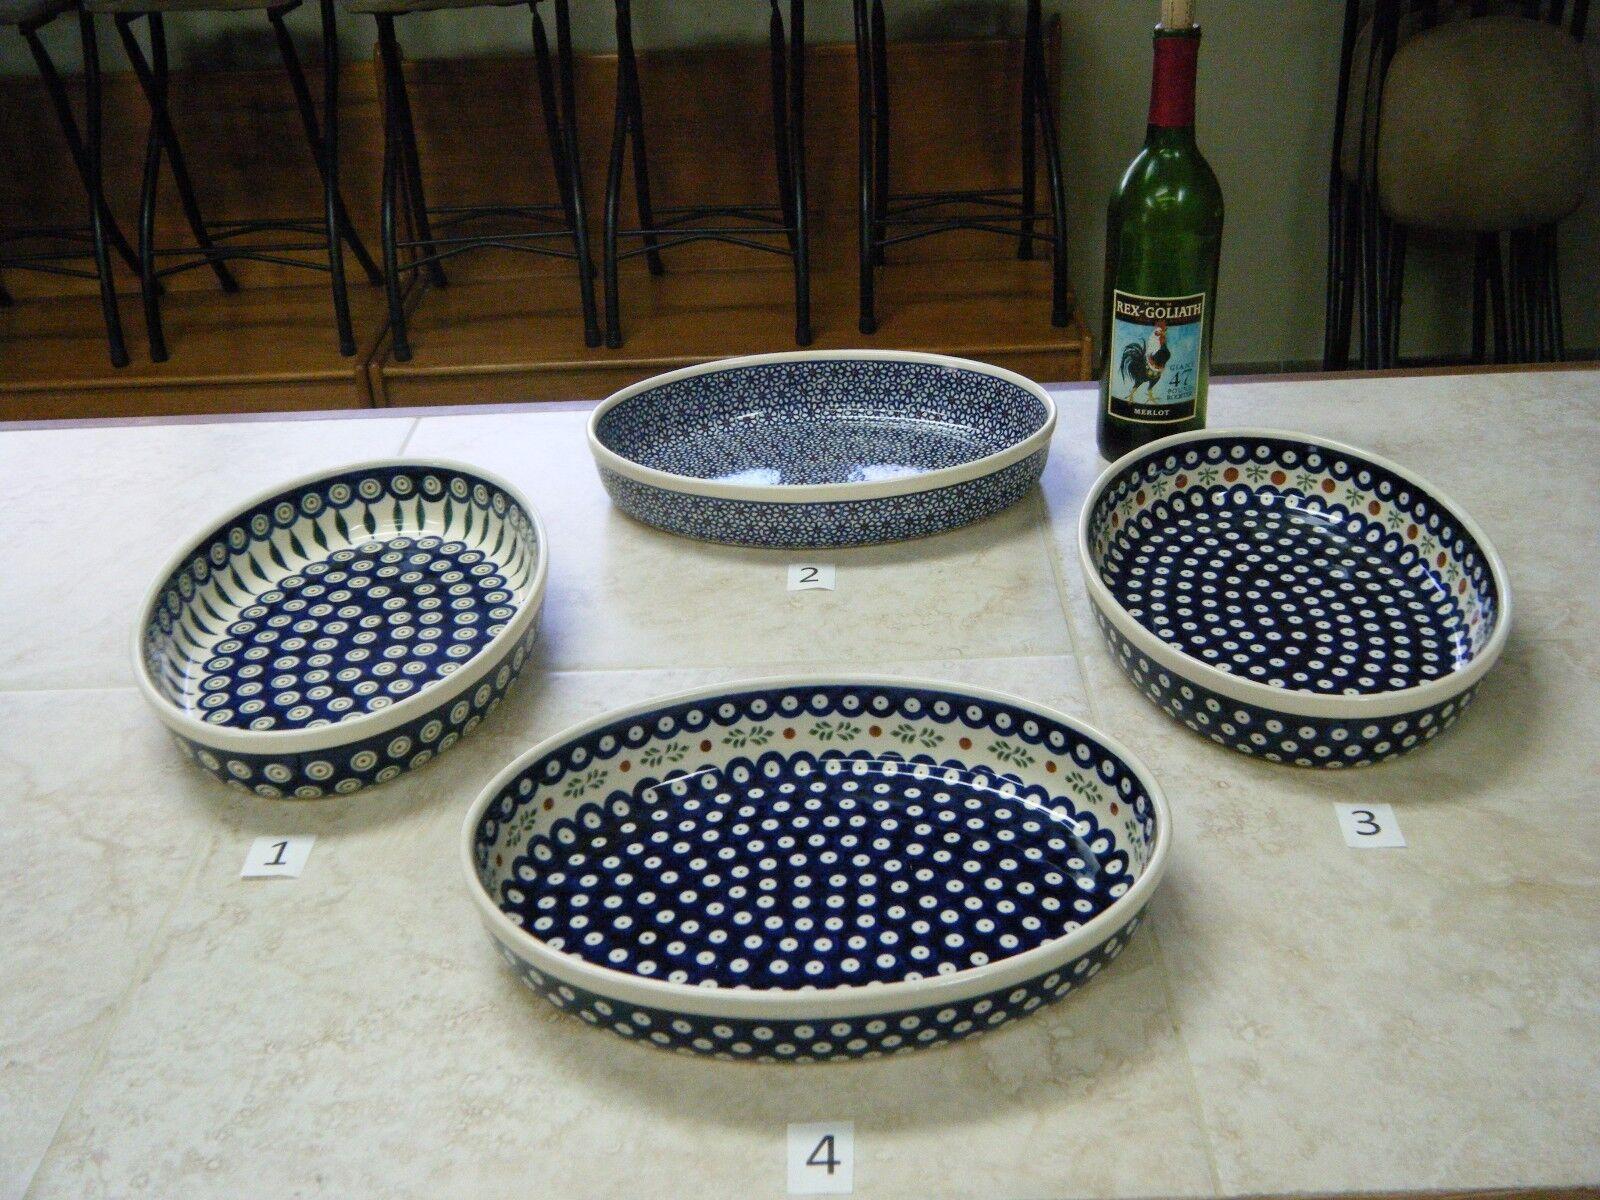 Finden, vergleichen, kaufen - Polish Pottery Large Oval Baker 12.5 X 9.25 X 2.75, Boleslawiec auf eBay.com ab 27.0 USD